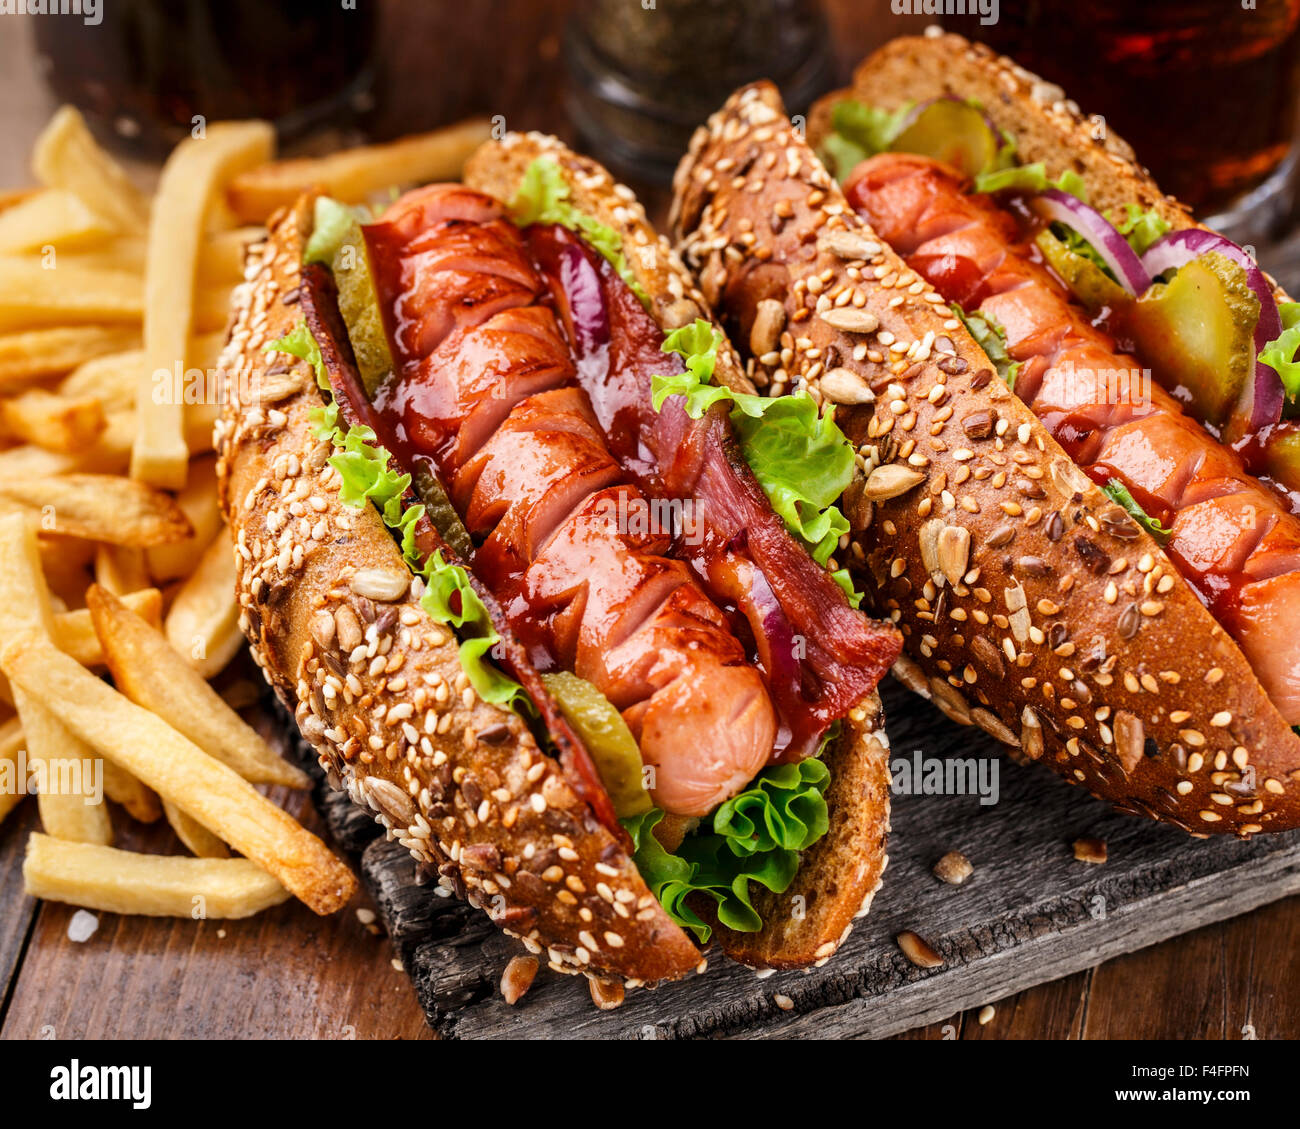 Barbecue Grill Hotdog mit Pommes frites Stockbild